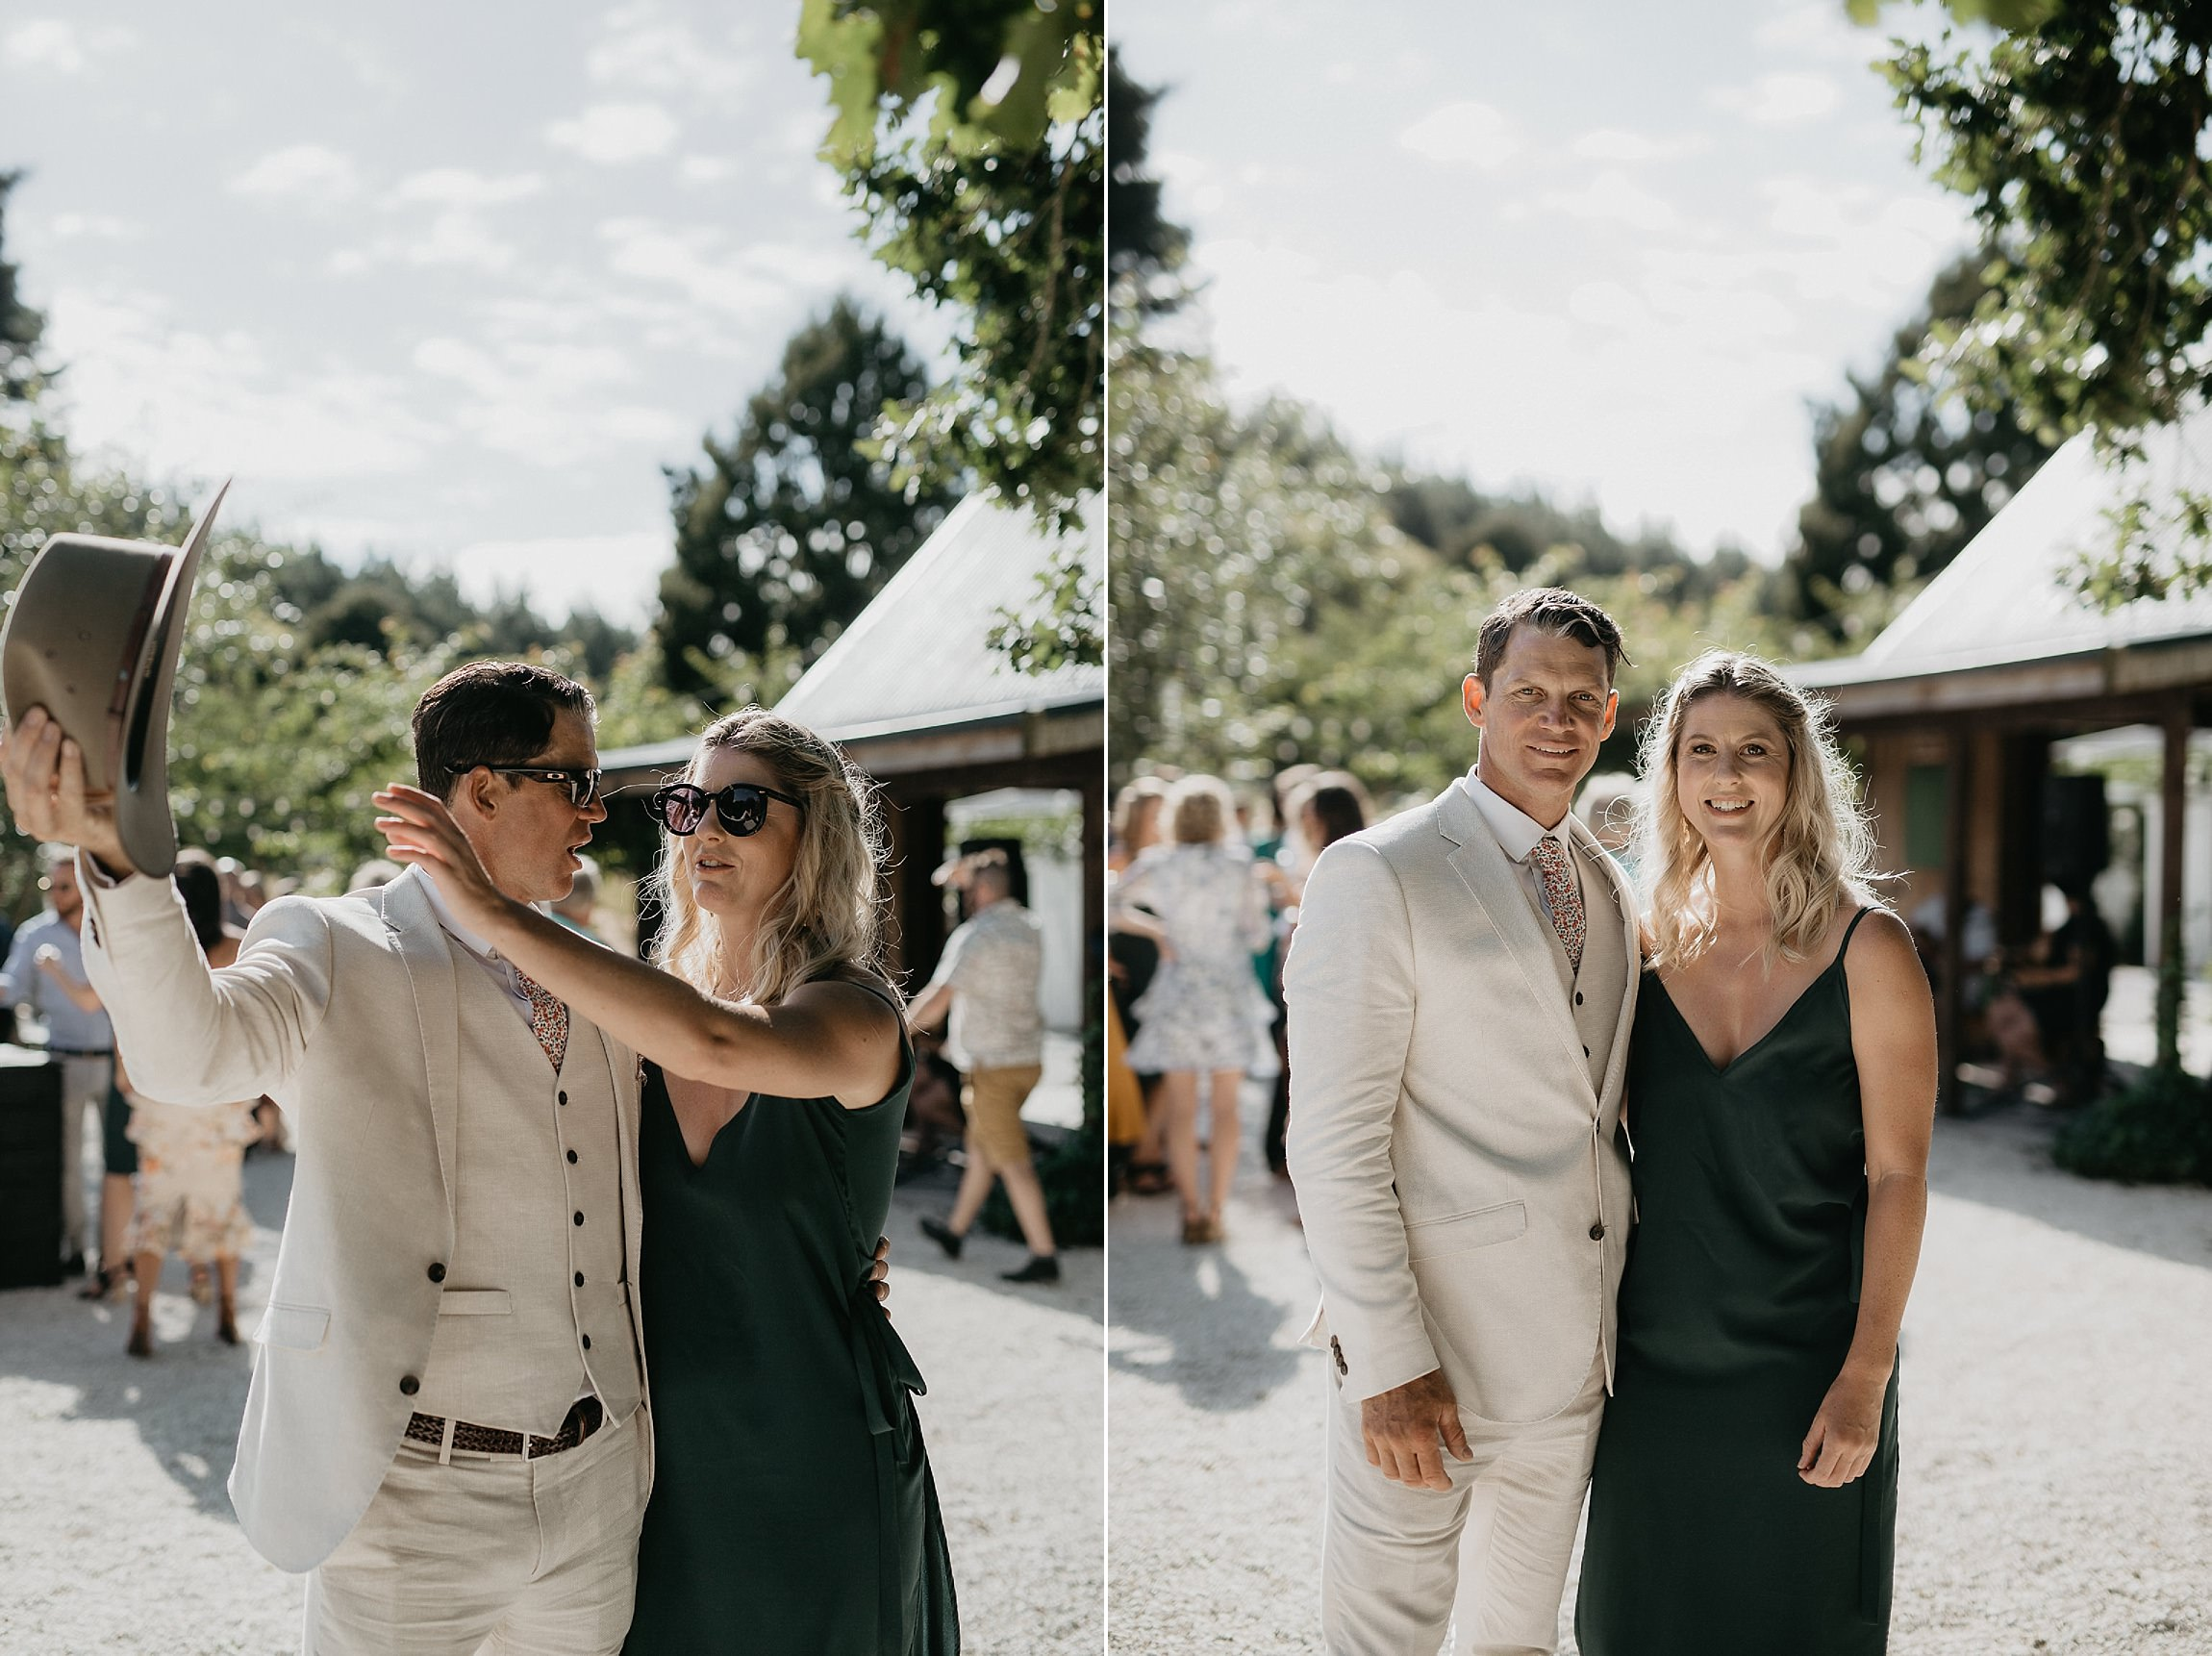 oldforestschool-wedding-blog-135.jpg